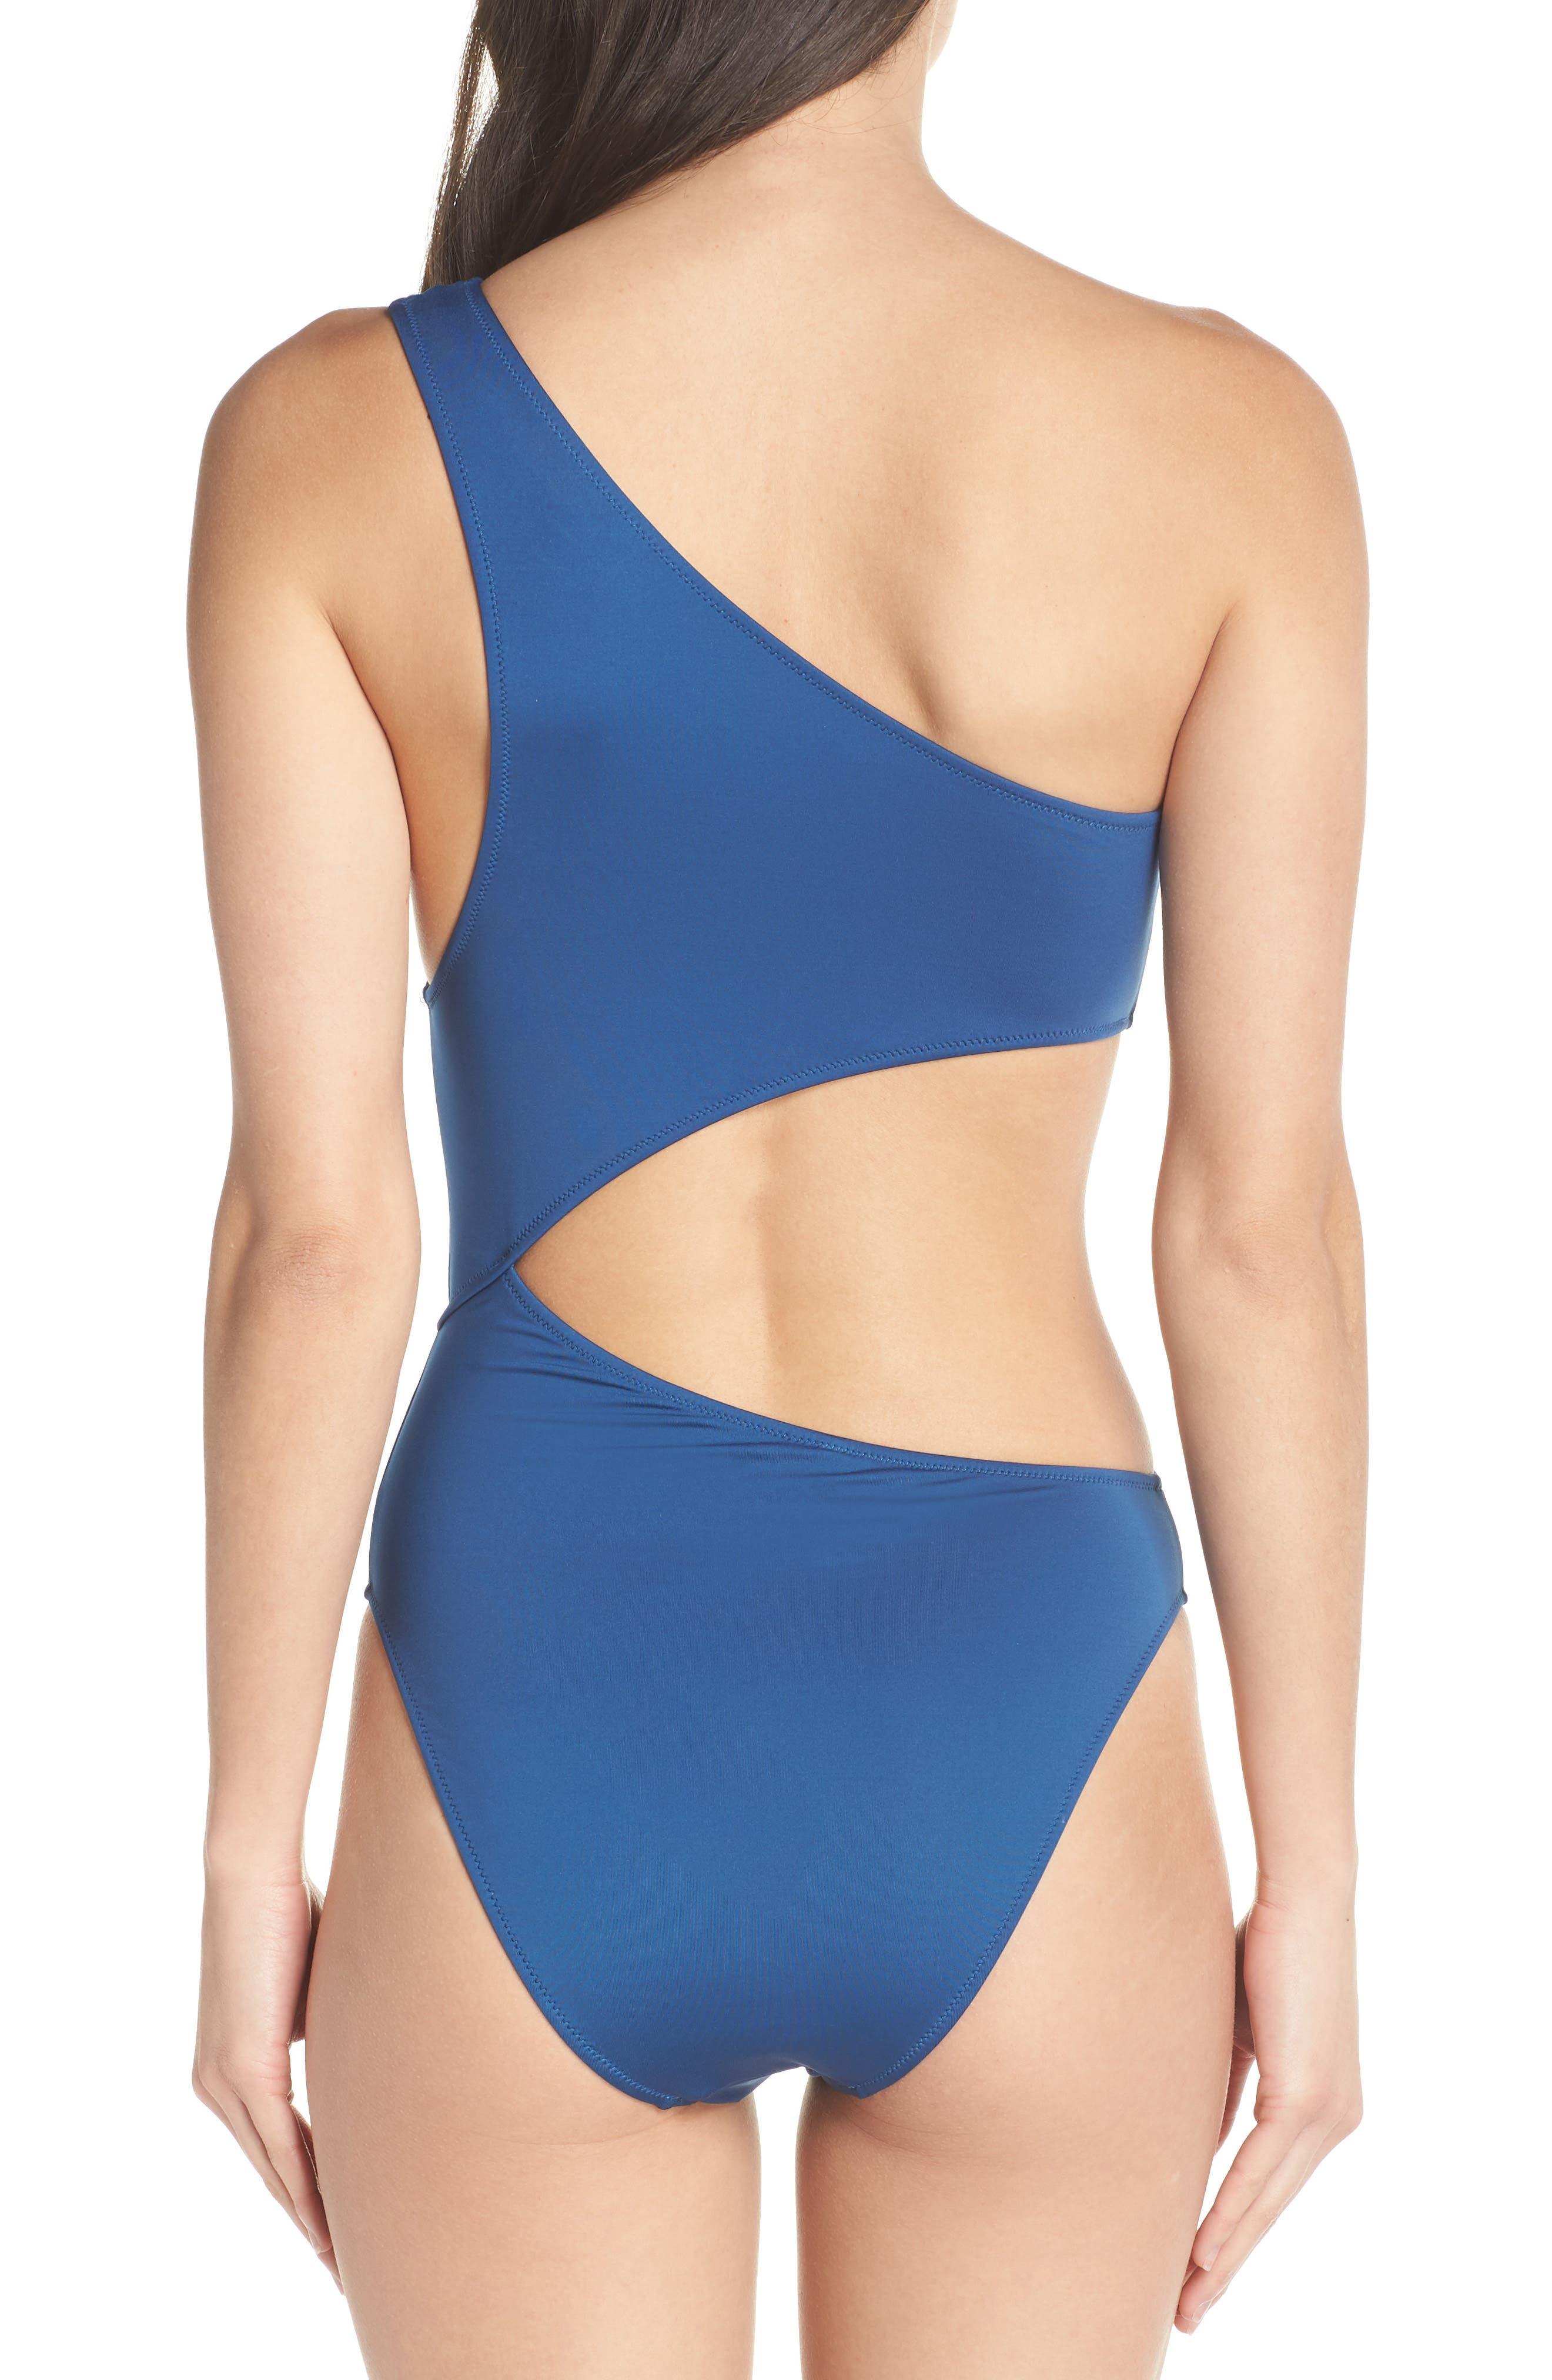 Playa Tilden One-Shoulder One-Piece Swimsuit,                             Alternate thumbnail 2, color,                             400